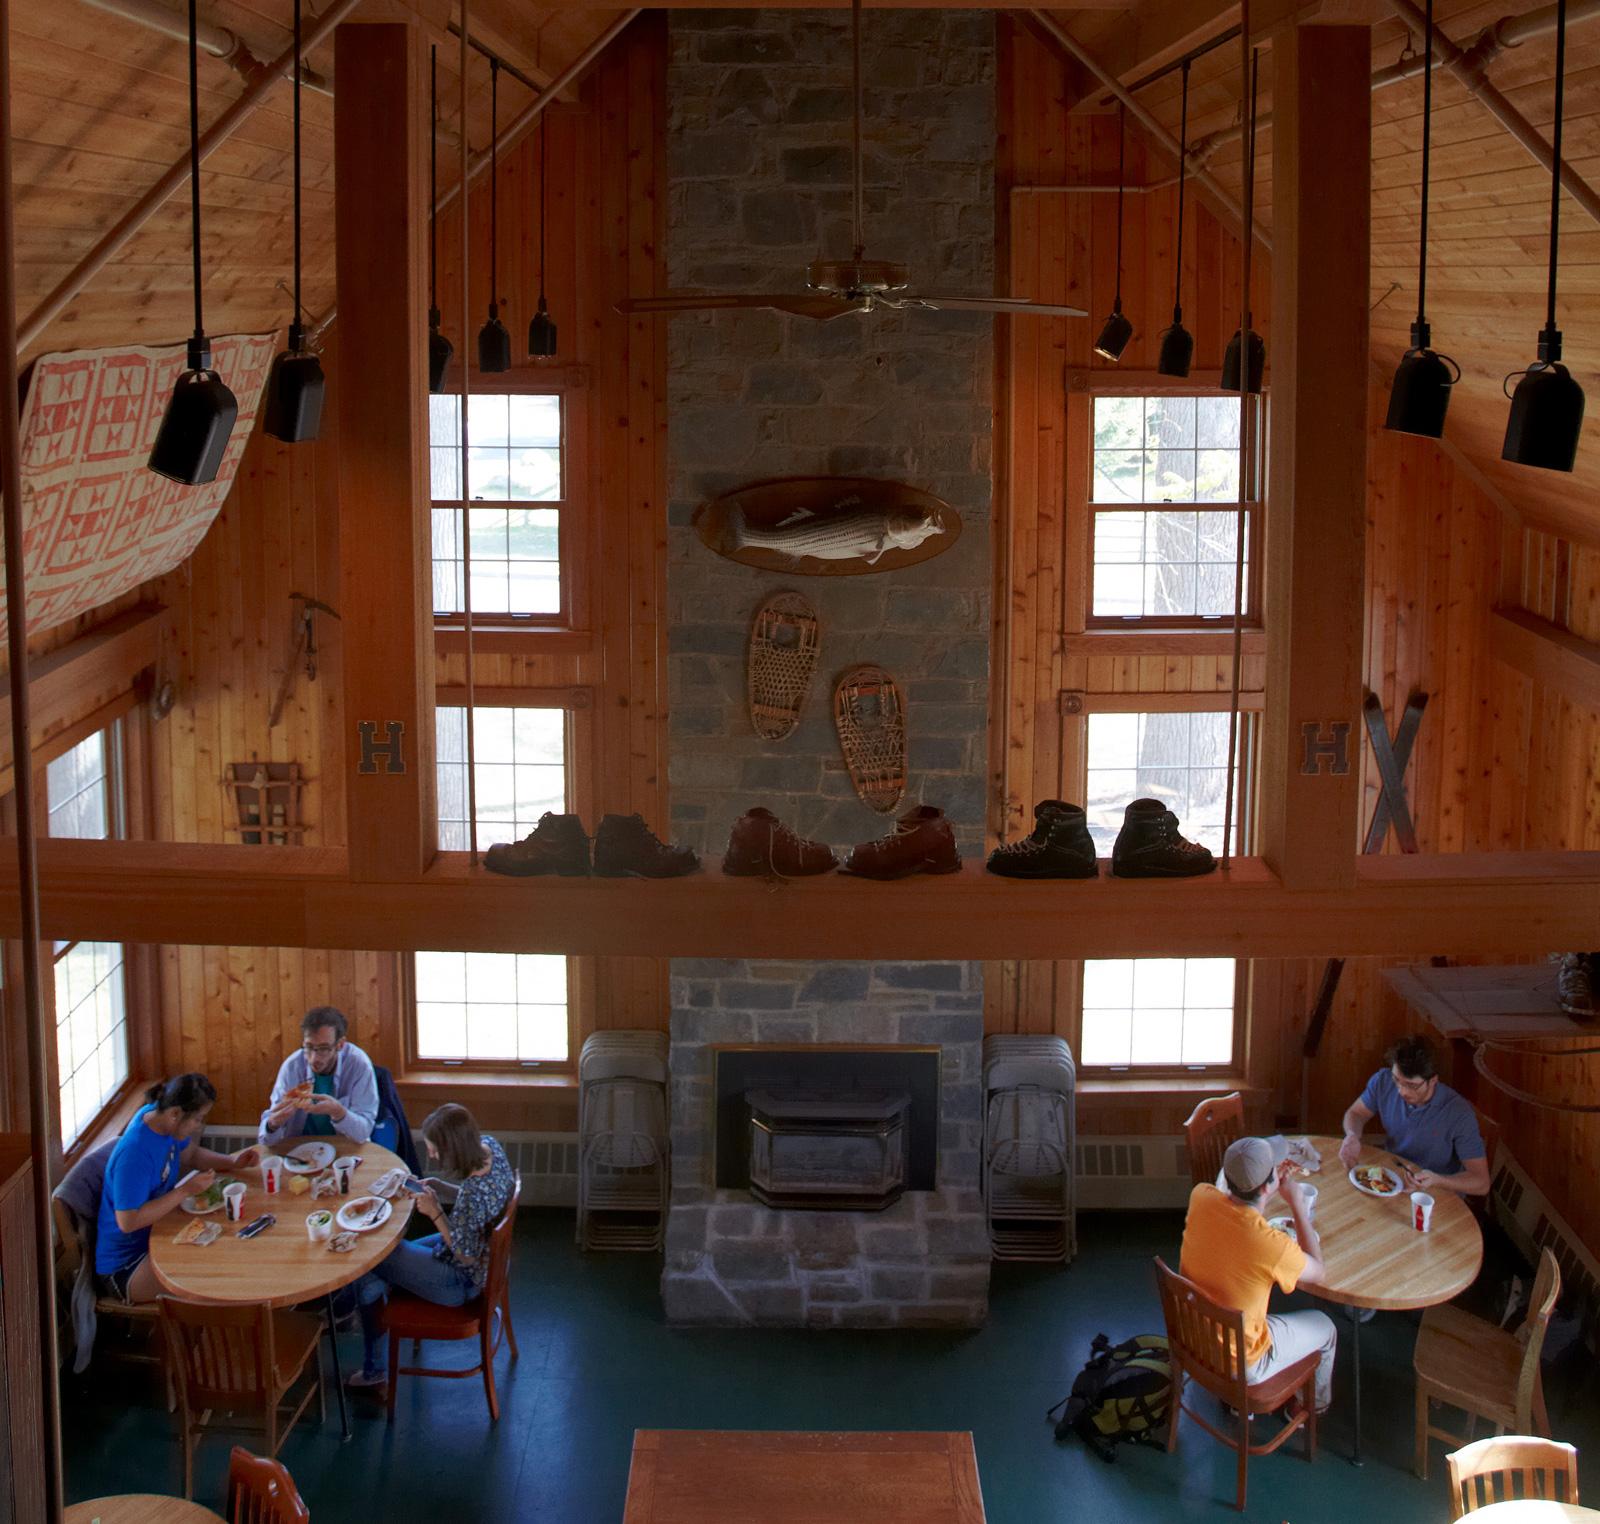 Dining Hall: Hamilton College